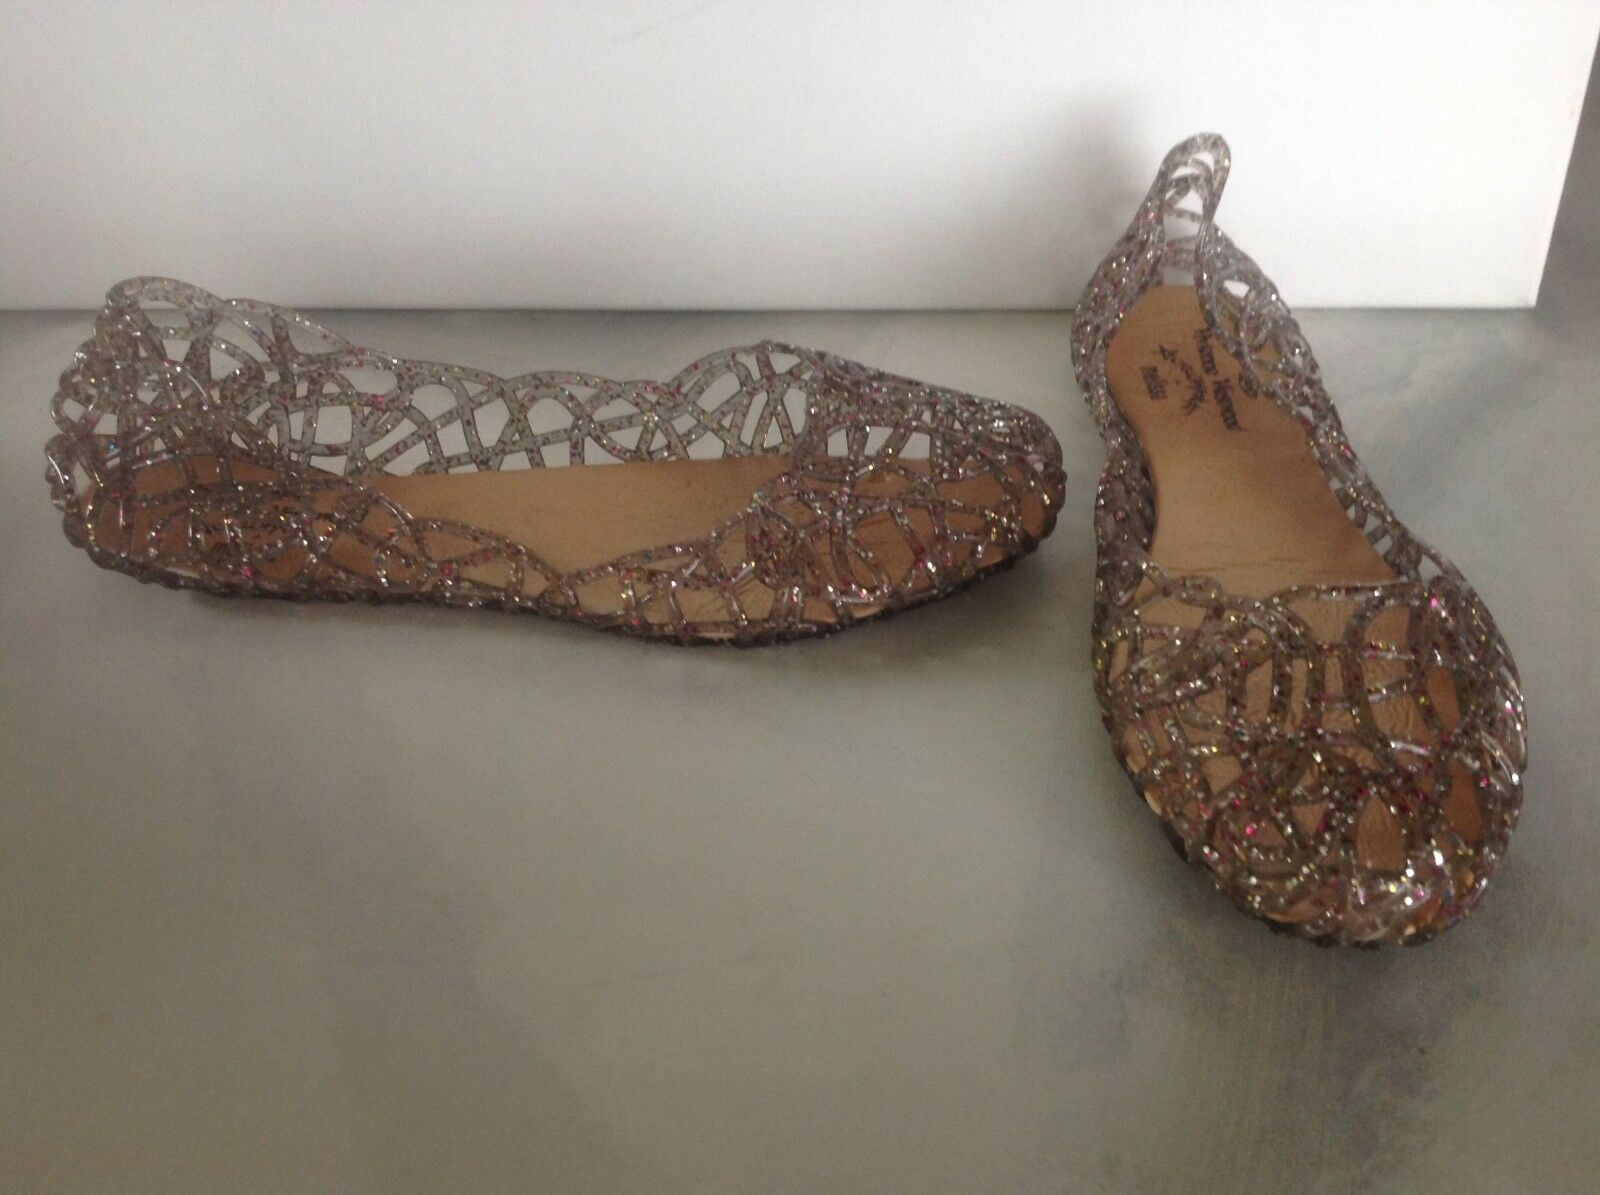 Melissa Toe Clear Confetti Glitter Peep Toe Melissa Ballerina Flats Vivienne Westwood 39 8.5 f437d8